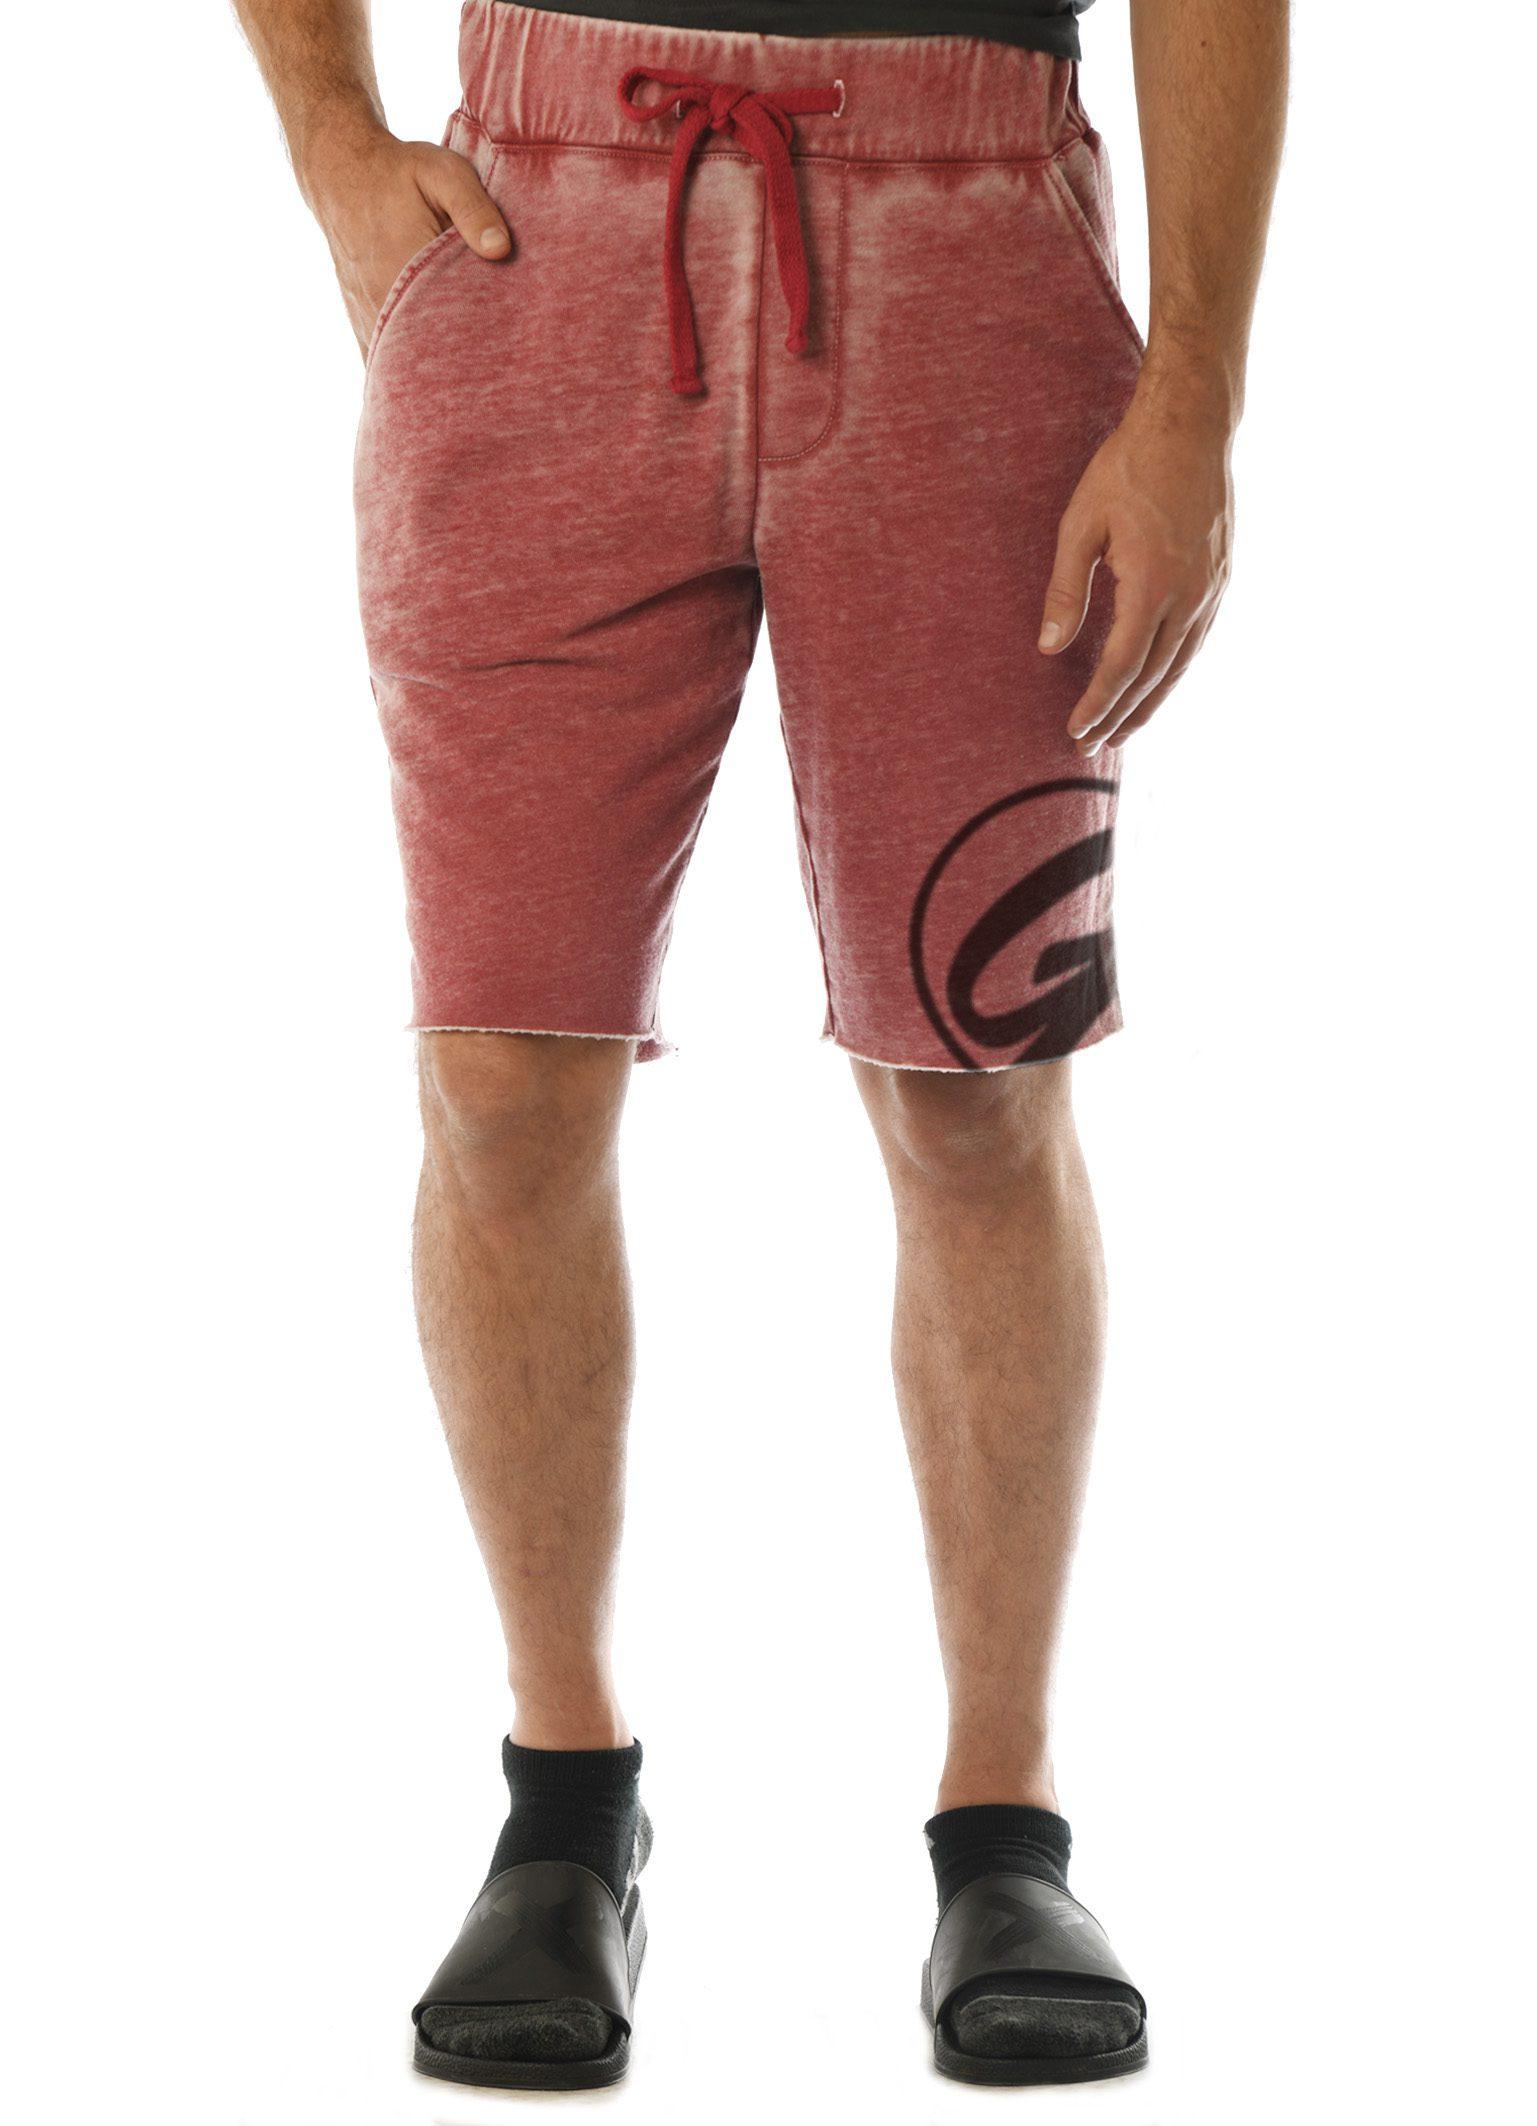 GG 315-FT-B Men's WornWash Shorts-front GG-X